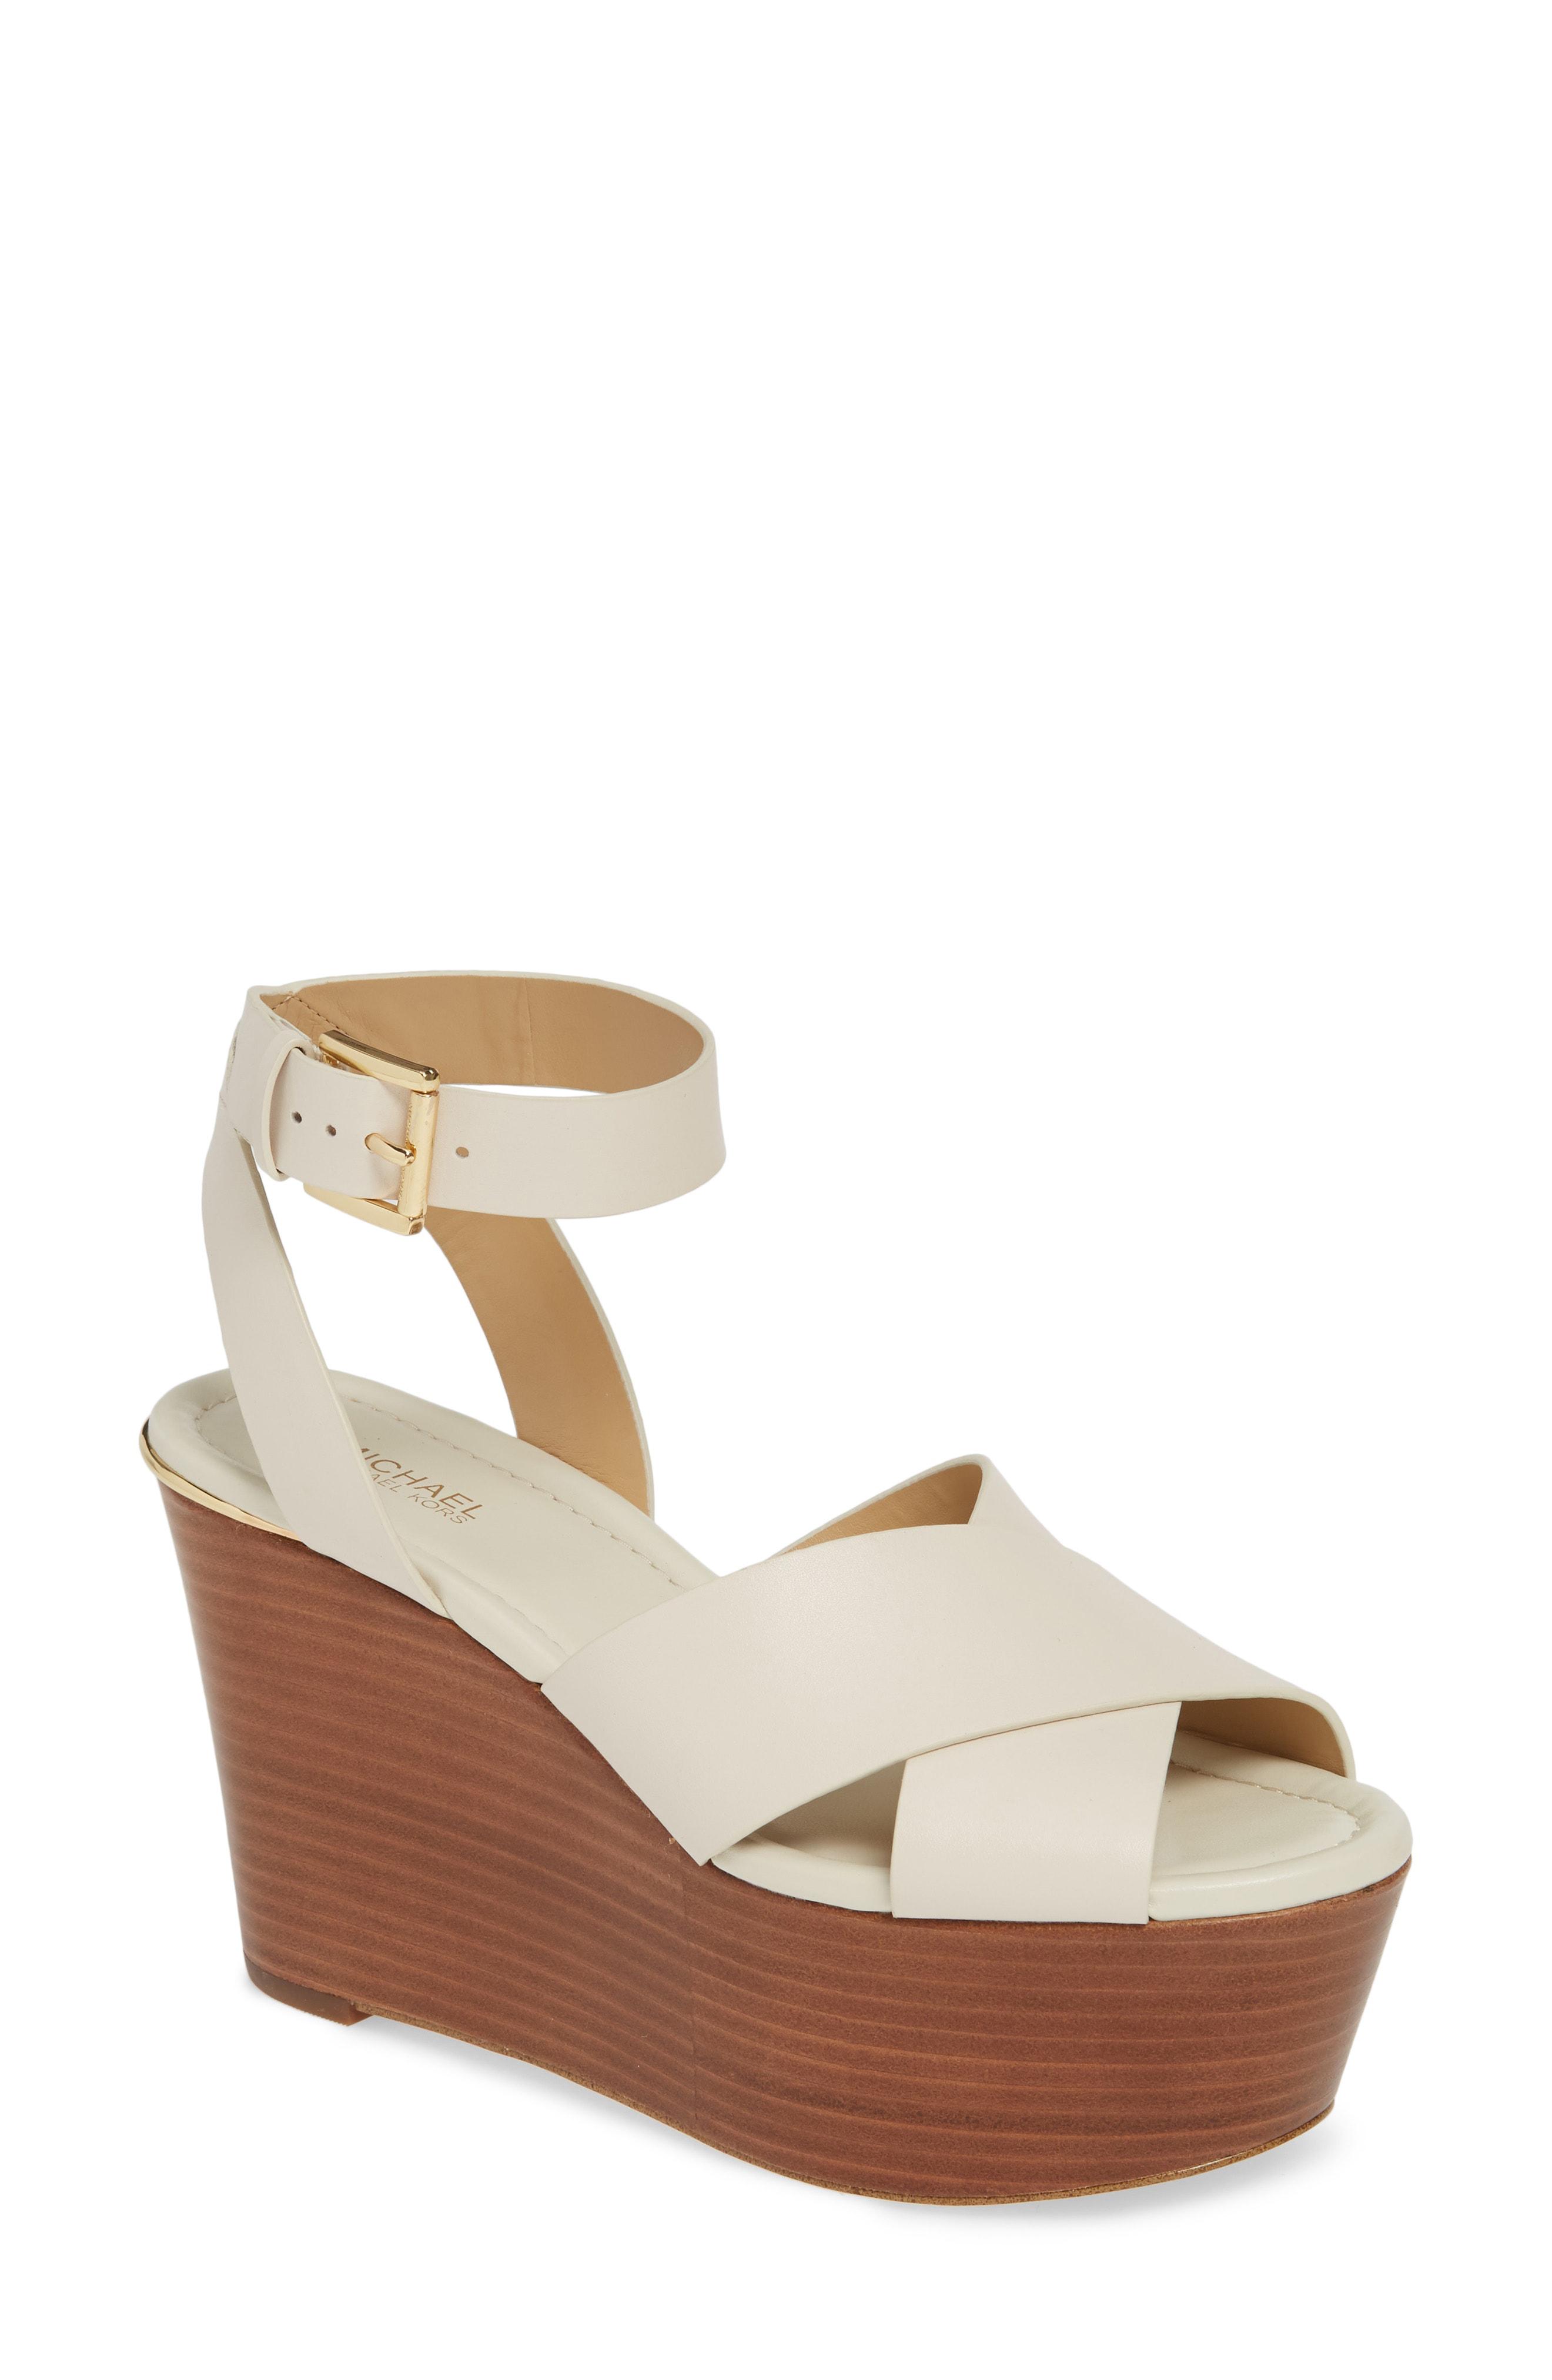 97571eb02292d Michael Michael Kors Abbott Platform Wedge Sandal In Cream Vachetta Leather